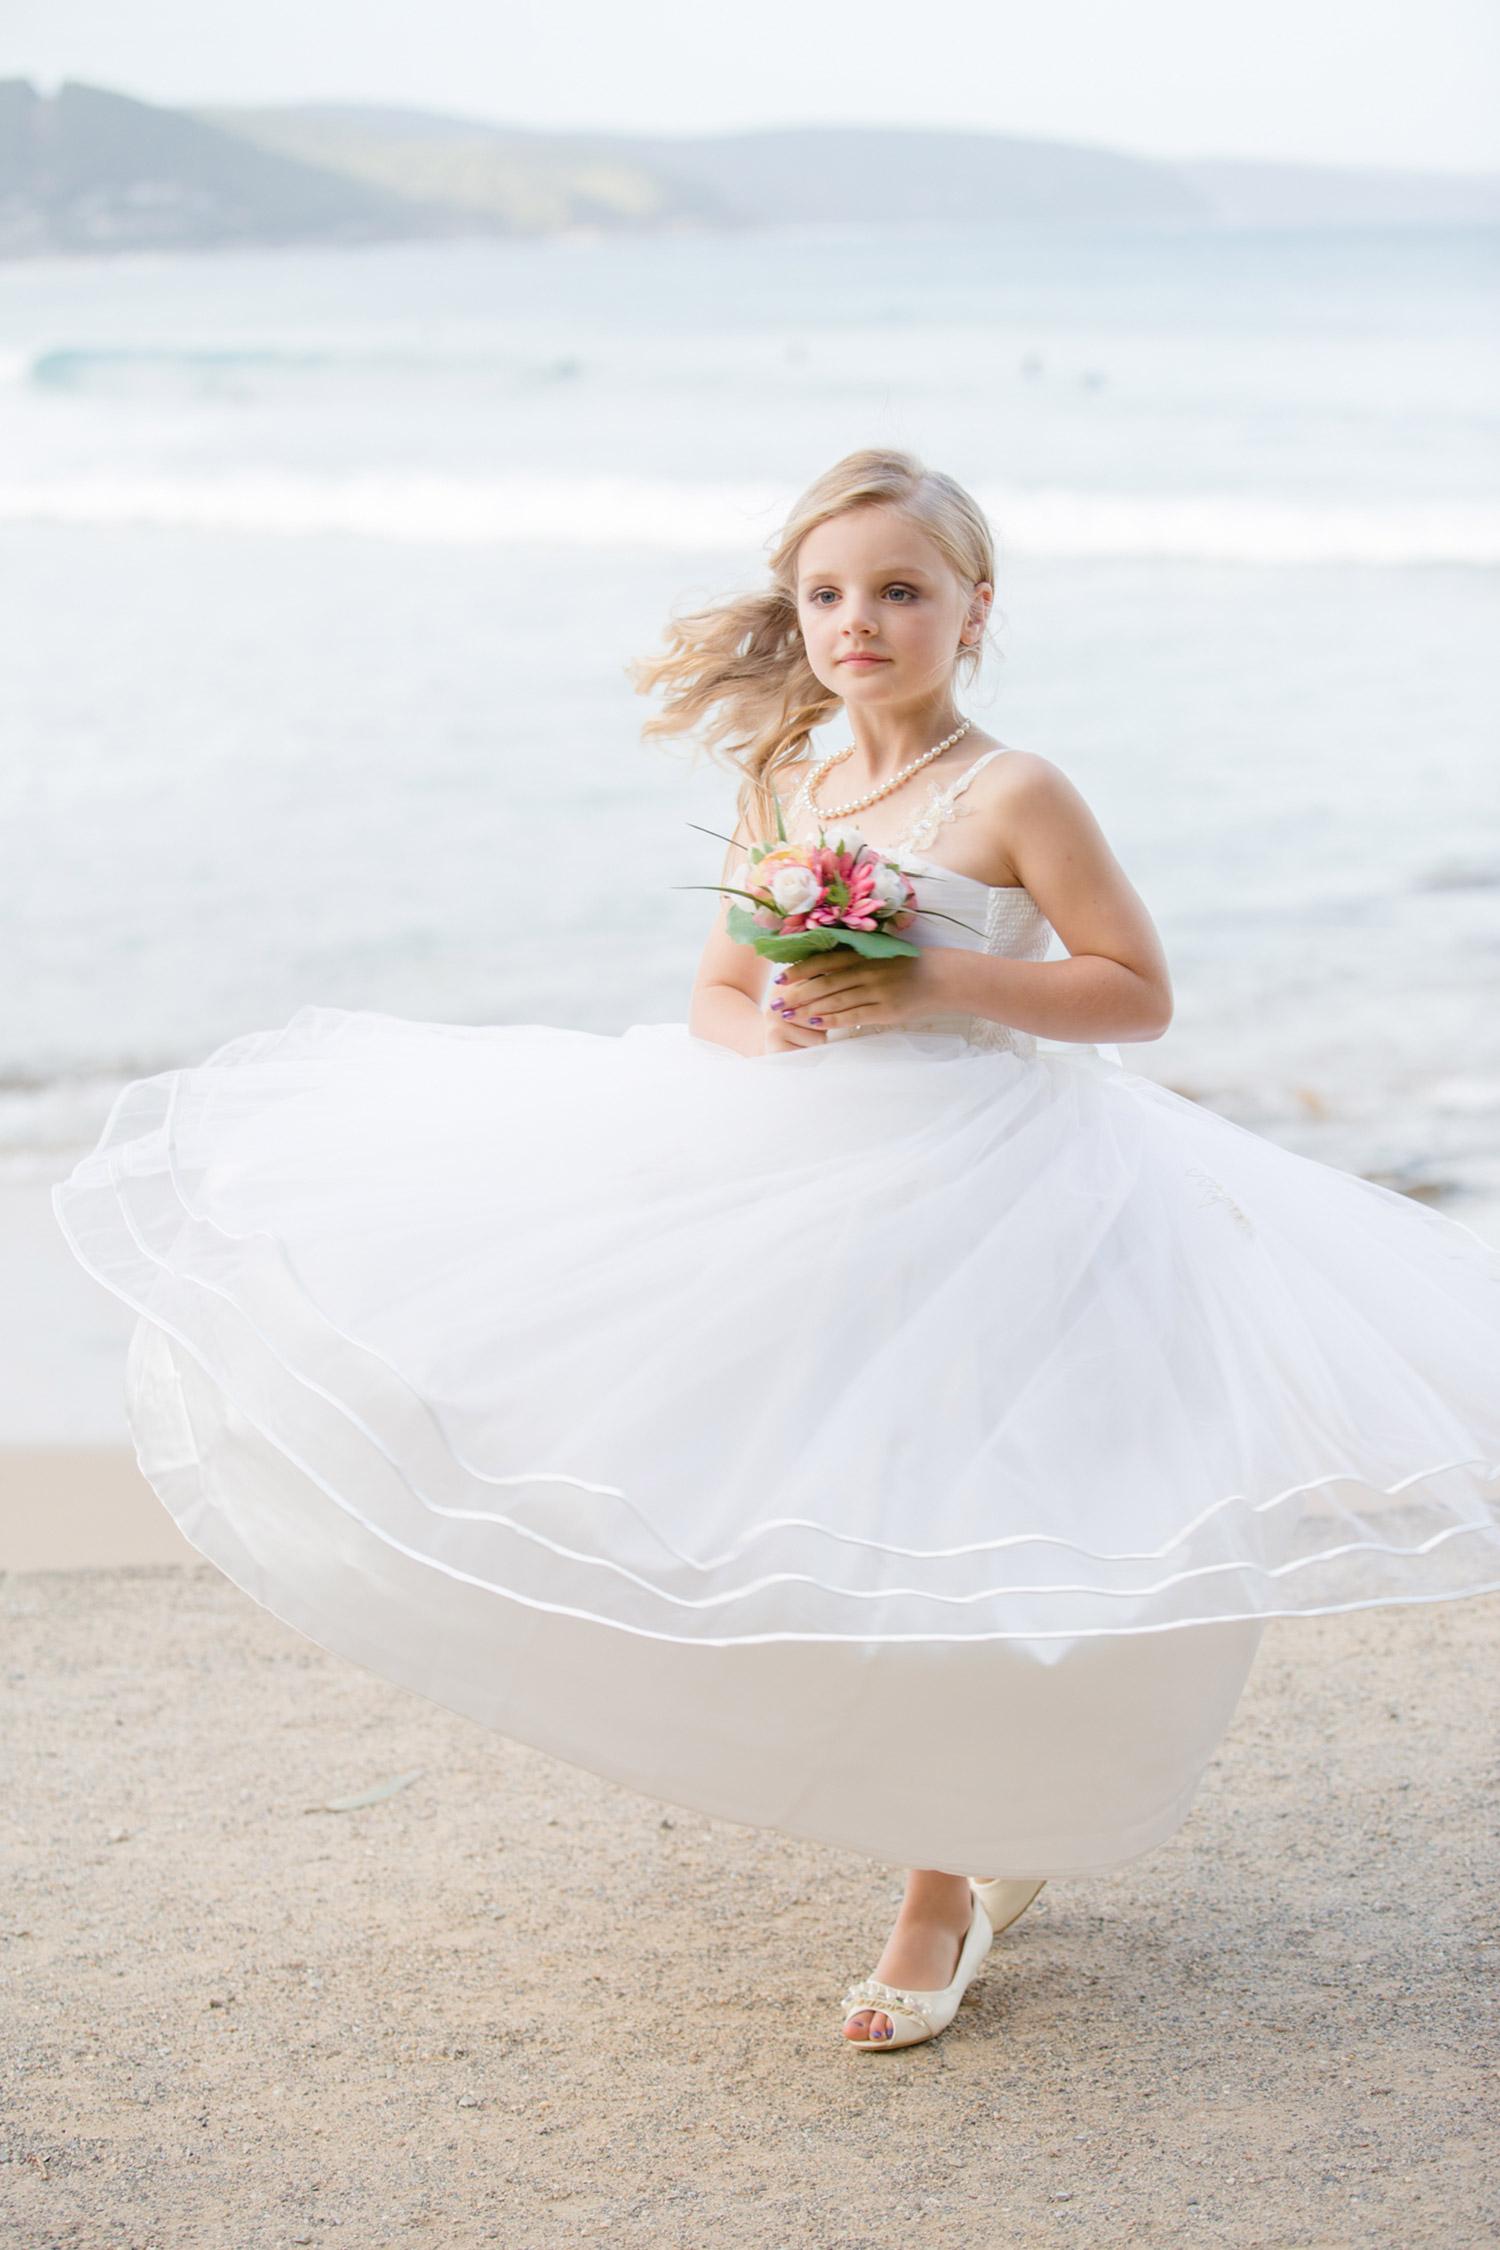 Whitsundays Top Photographer - Destination Wedding Specialist